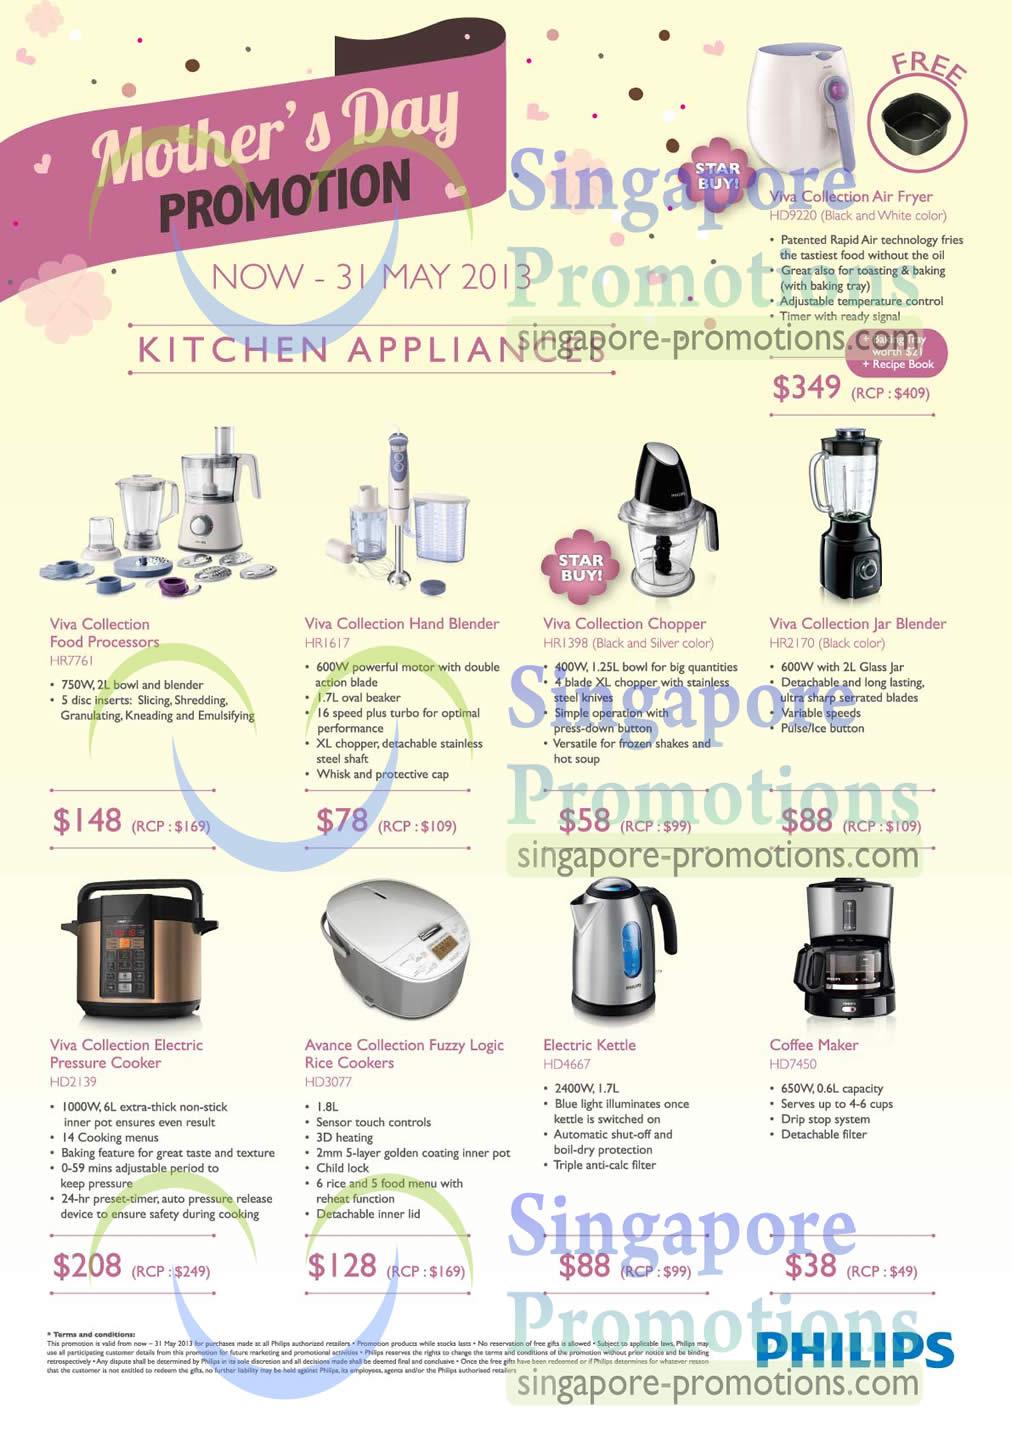 Philips Air Fryer HD9220, Philips Food Processor HR7761, Philips Hand Blender HR1617, Philips Chopper HR1398, Philips Jar Blender HR2170, Philips Pressure Cooker HD2139, Philips Rice Cooker HD3077, Philips Kettle HD4667 and Philips Coffee Maker HD7450